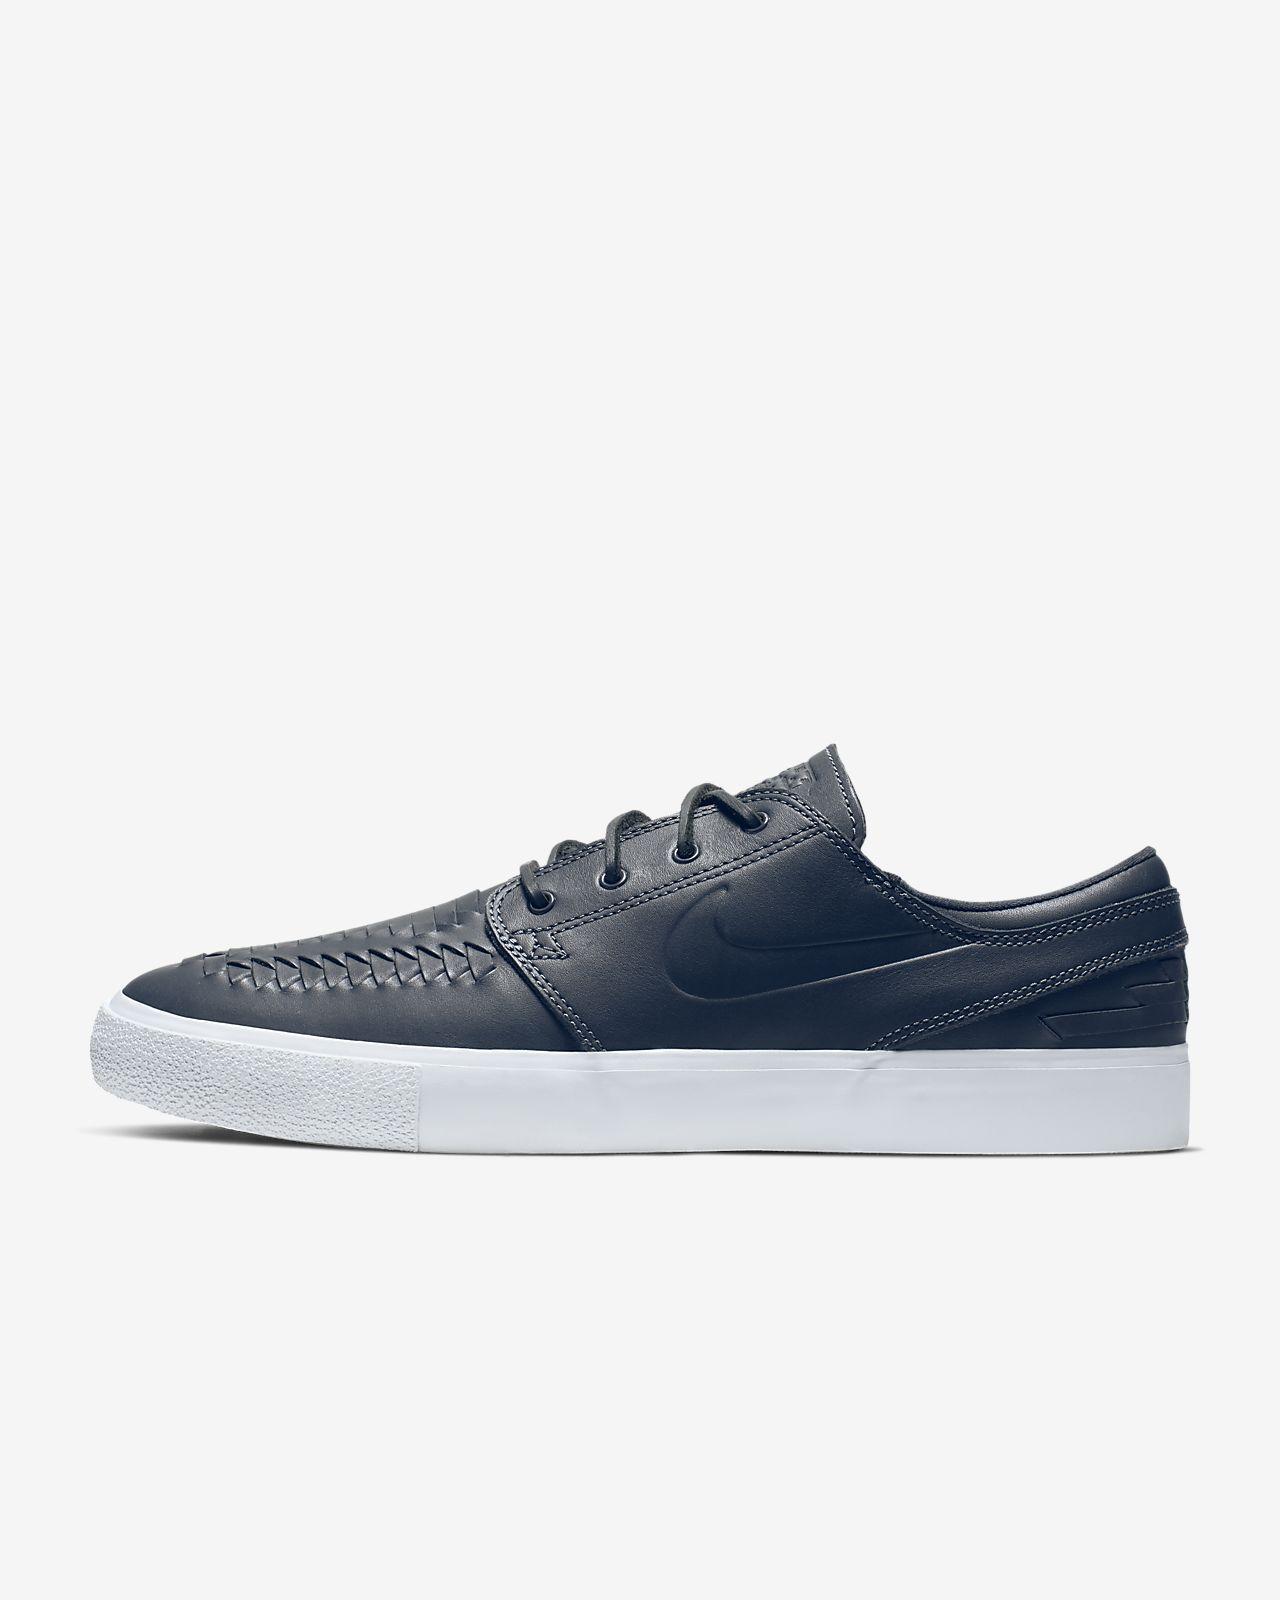 Nike SB Zoom Stefan Janoski RM Crafted Skateboardschuh